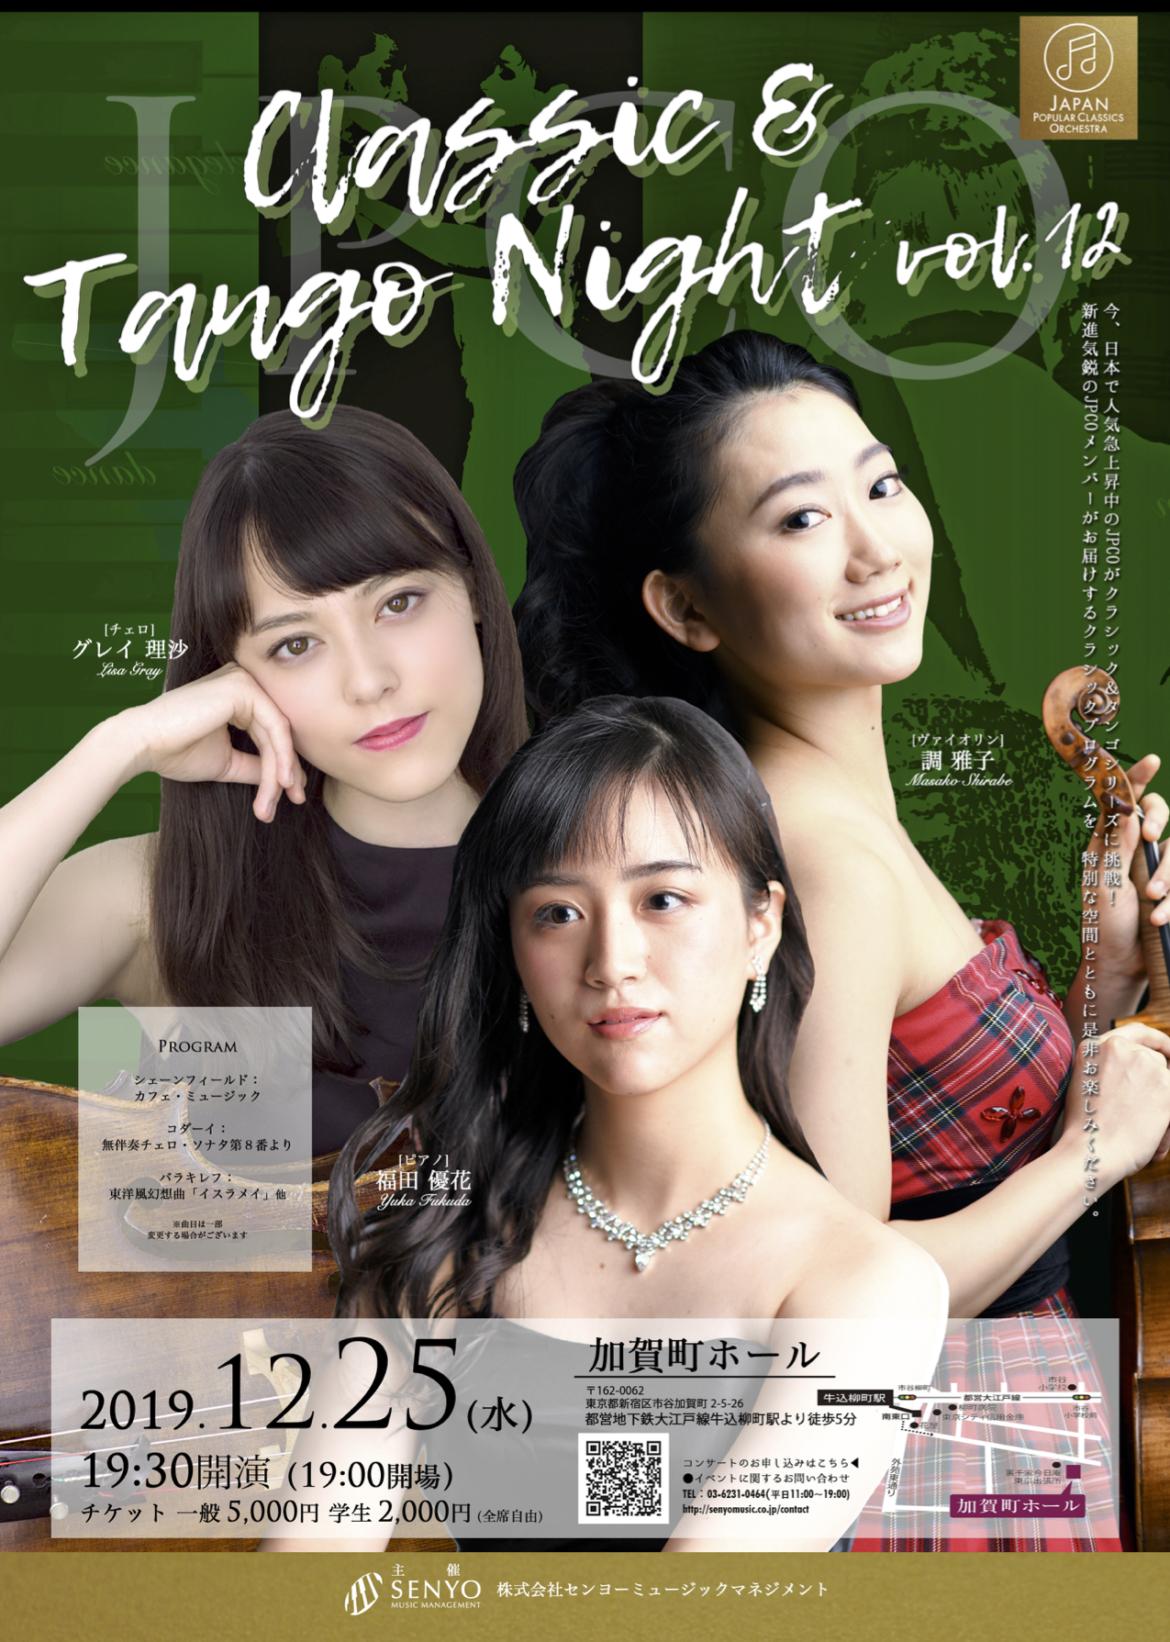 2019.12.25  JPCO CLASSIC & TANGO NIGHT  vol.12